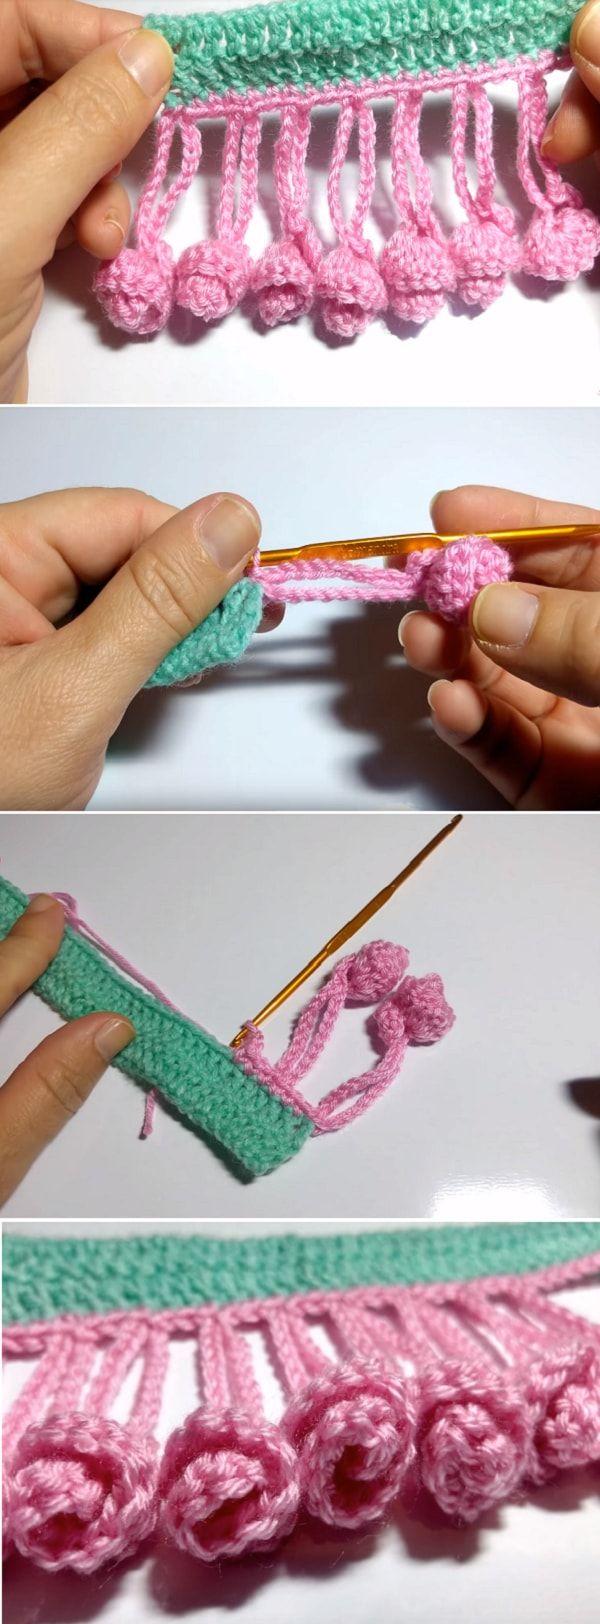 Crochet Rococo Flower edging - Video Tutorial | Pinterest